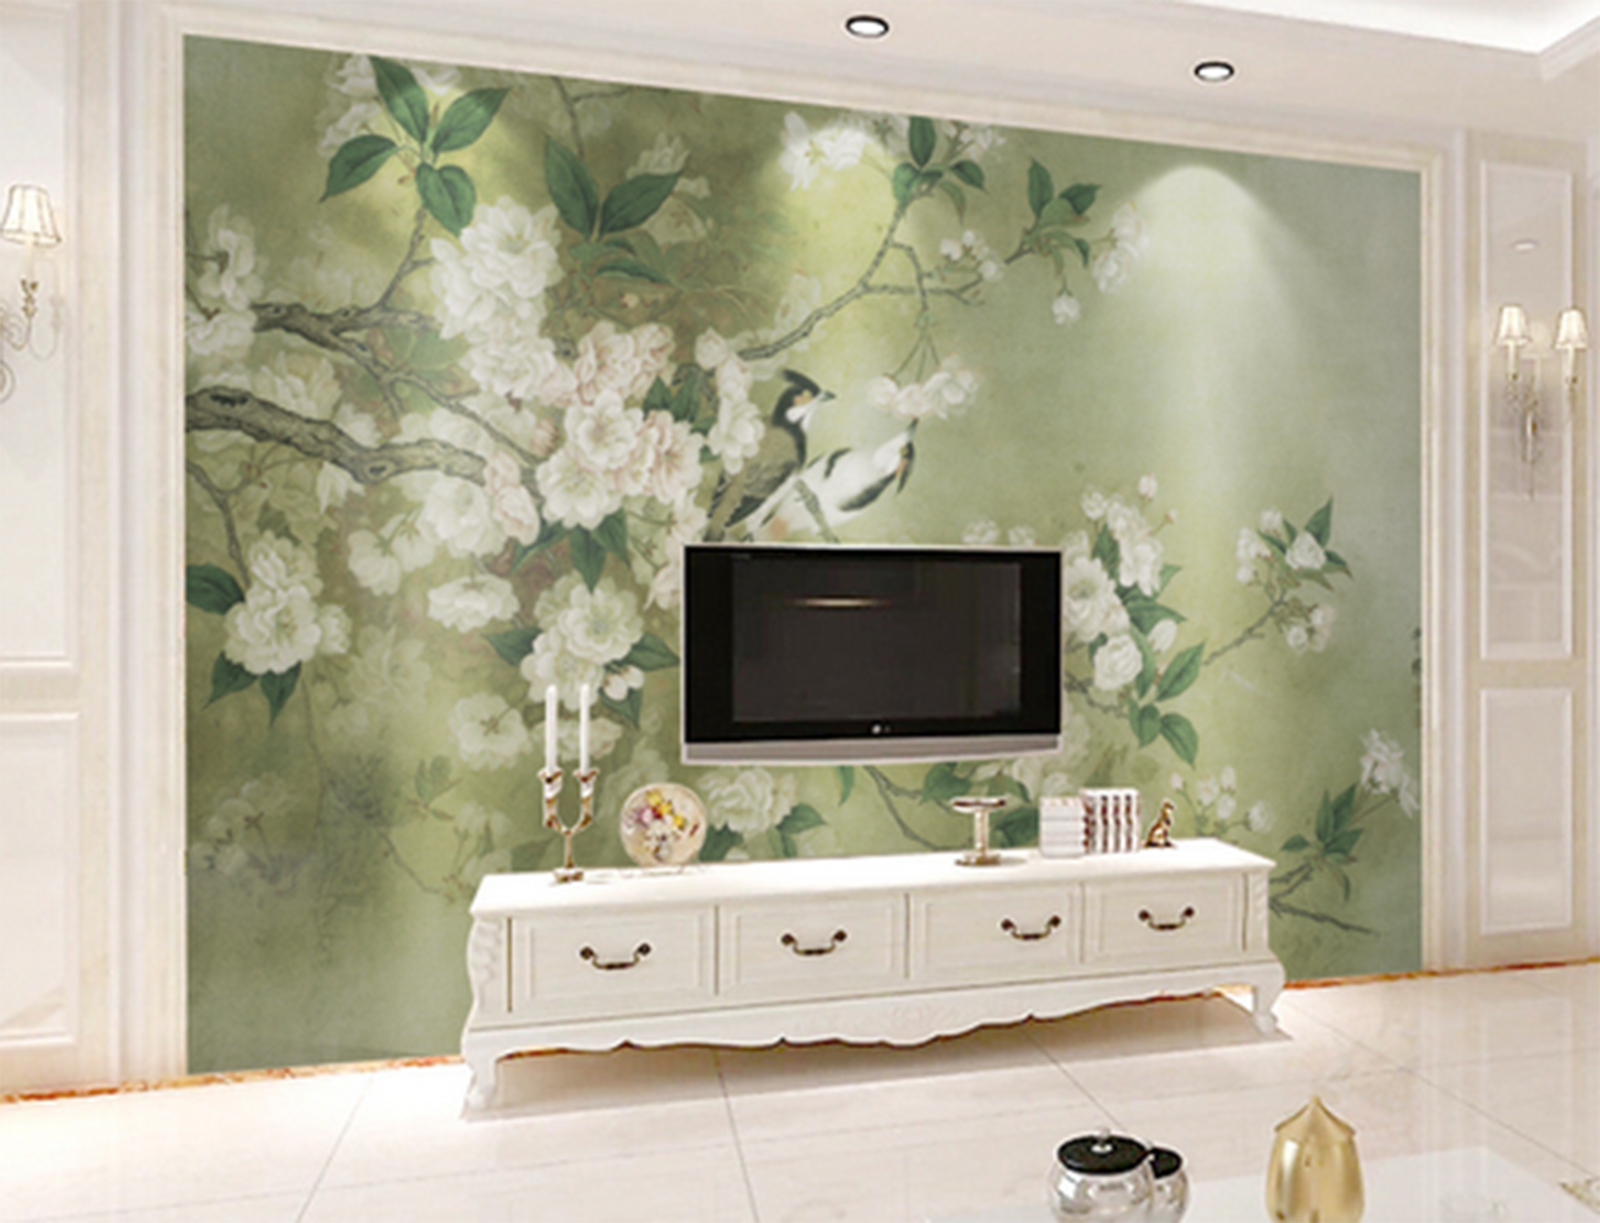 3D Flower Weiß 655 Wallpaper Murals Wall Print Wallpaper Mural AJ WALL AU Kyra